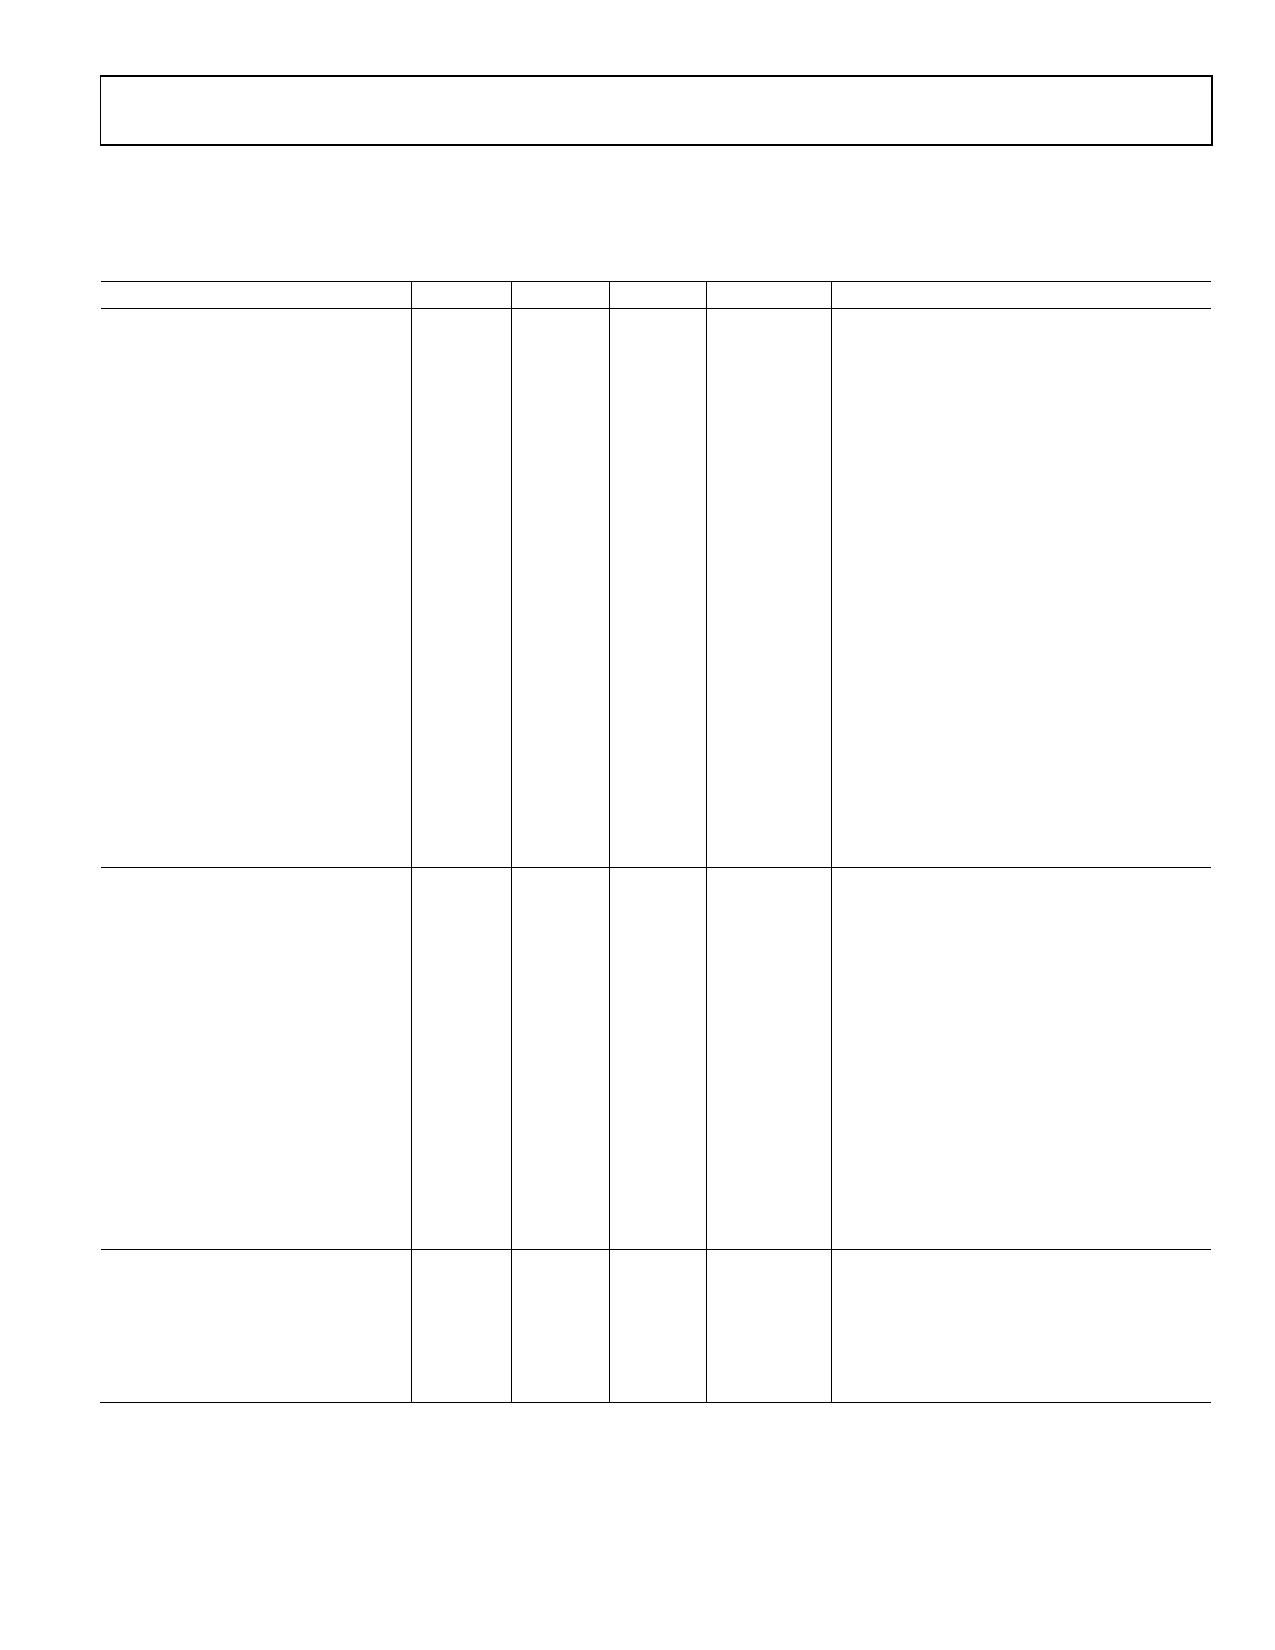 AD5660 pdf, arduino